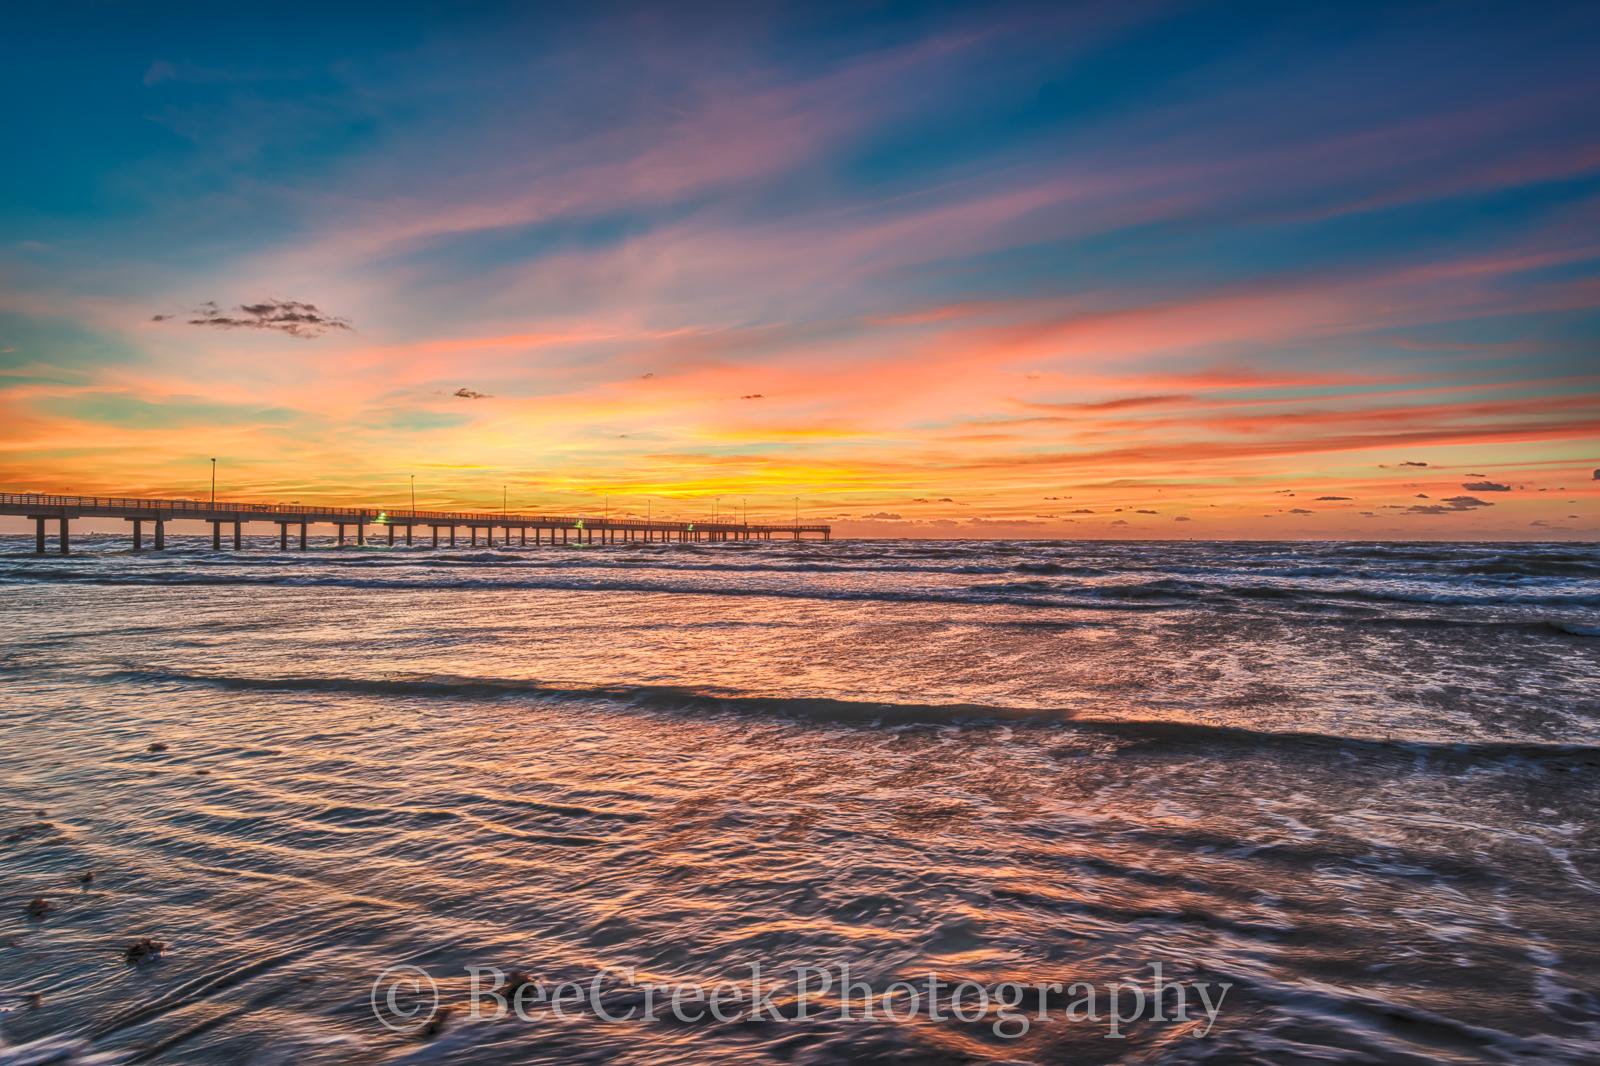 Caldwell pier, Port Aransas, Sunrise, Texas Coast, coastal, fishing, gulf of mexico, ocean beach, ripples sand, sea weeds, seascape, shore, surf, texas beaches, texas gulf, waves, fiery, red, orange, , photo